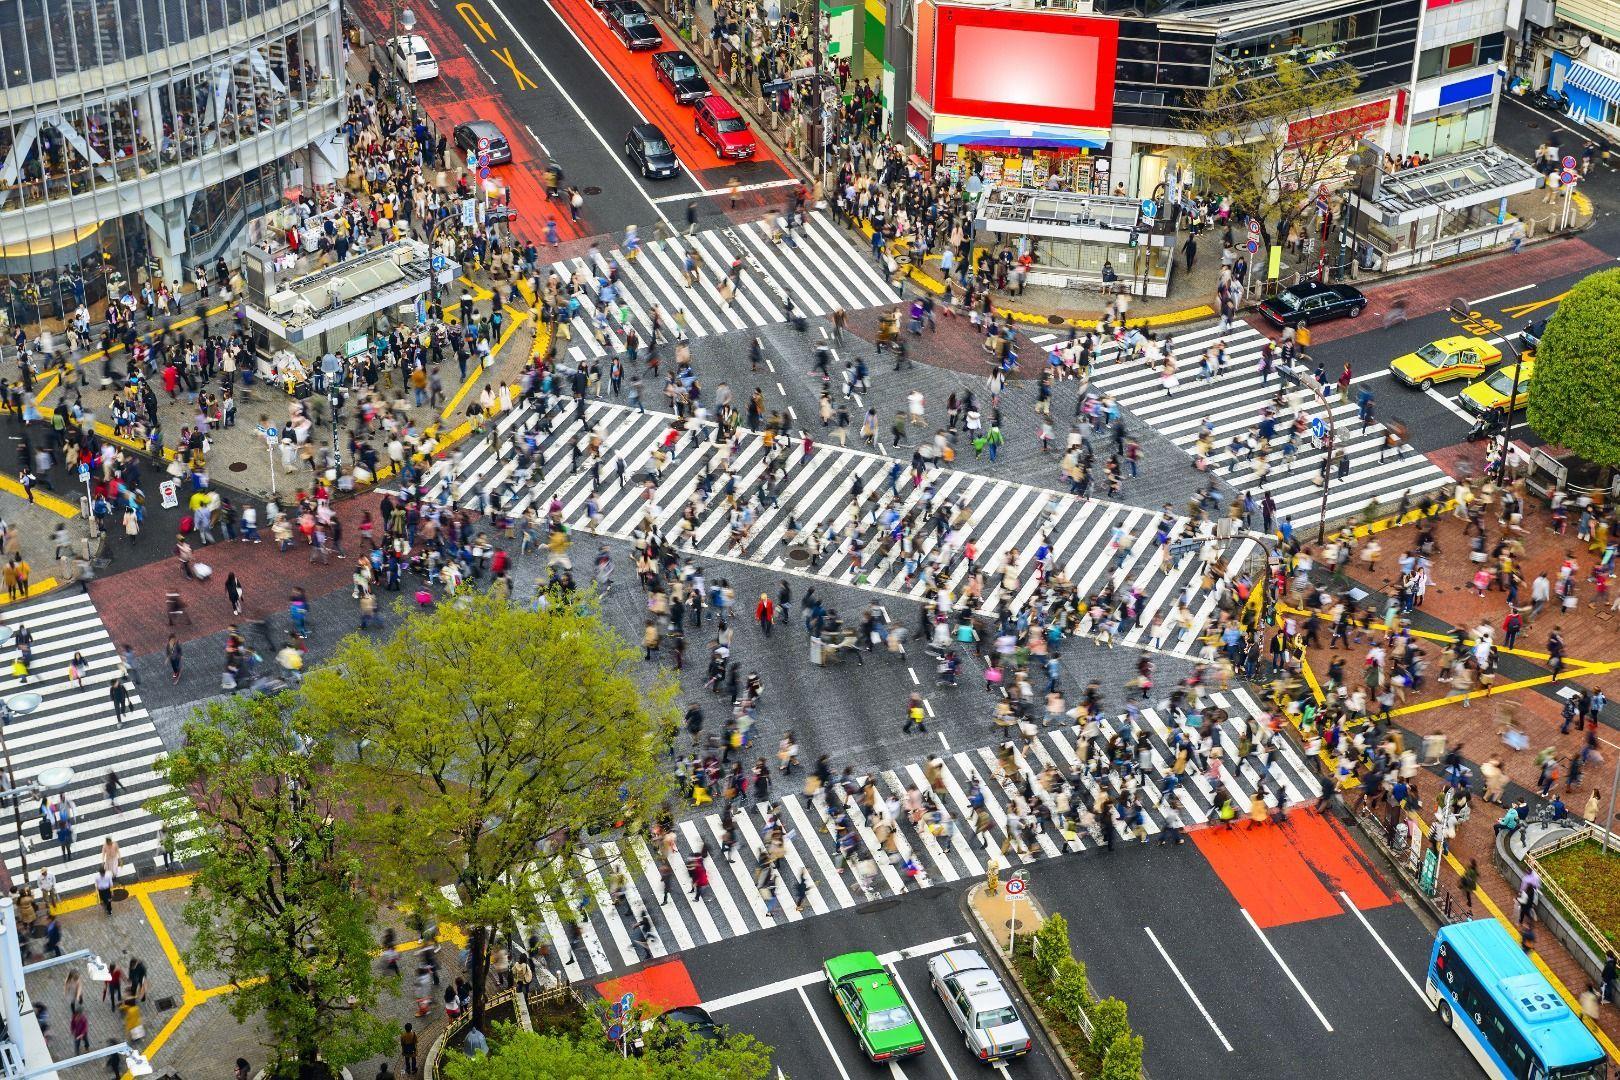 JR Shibuya station scramble crossing